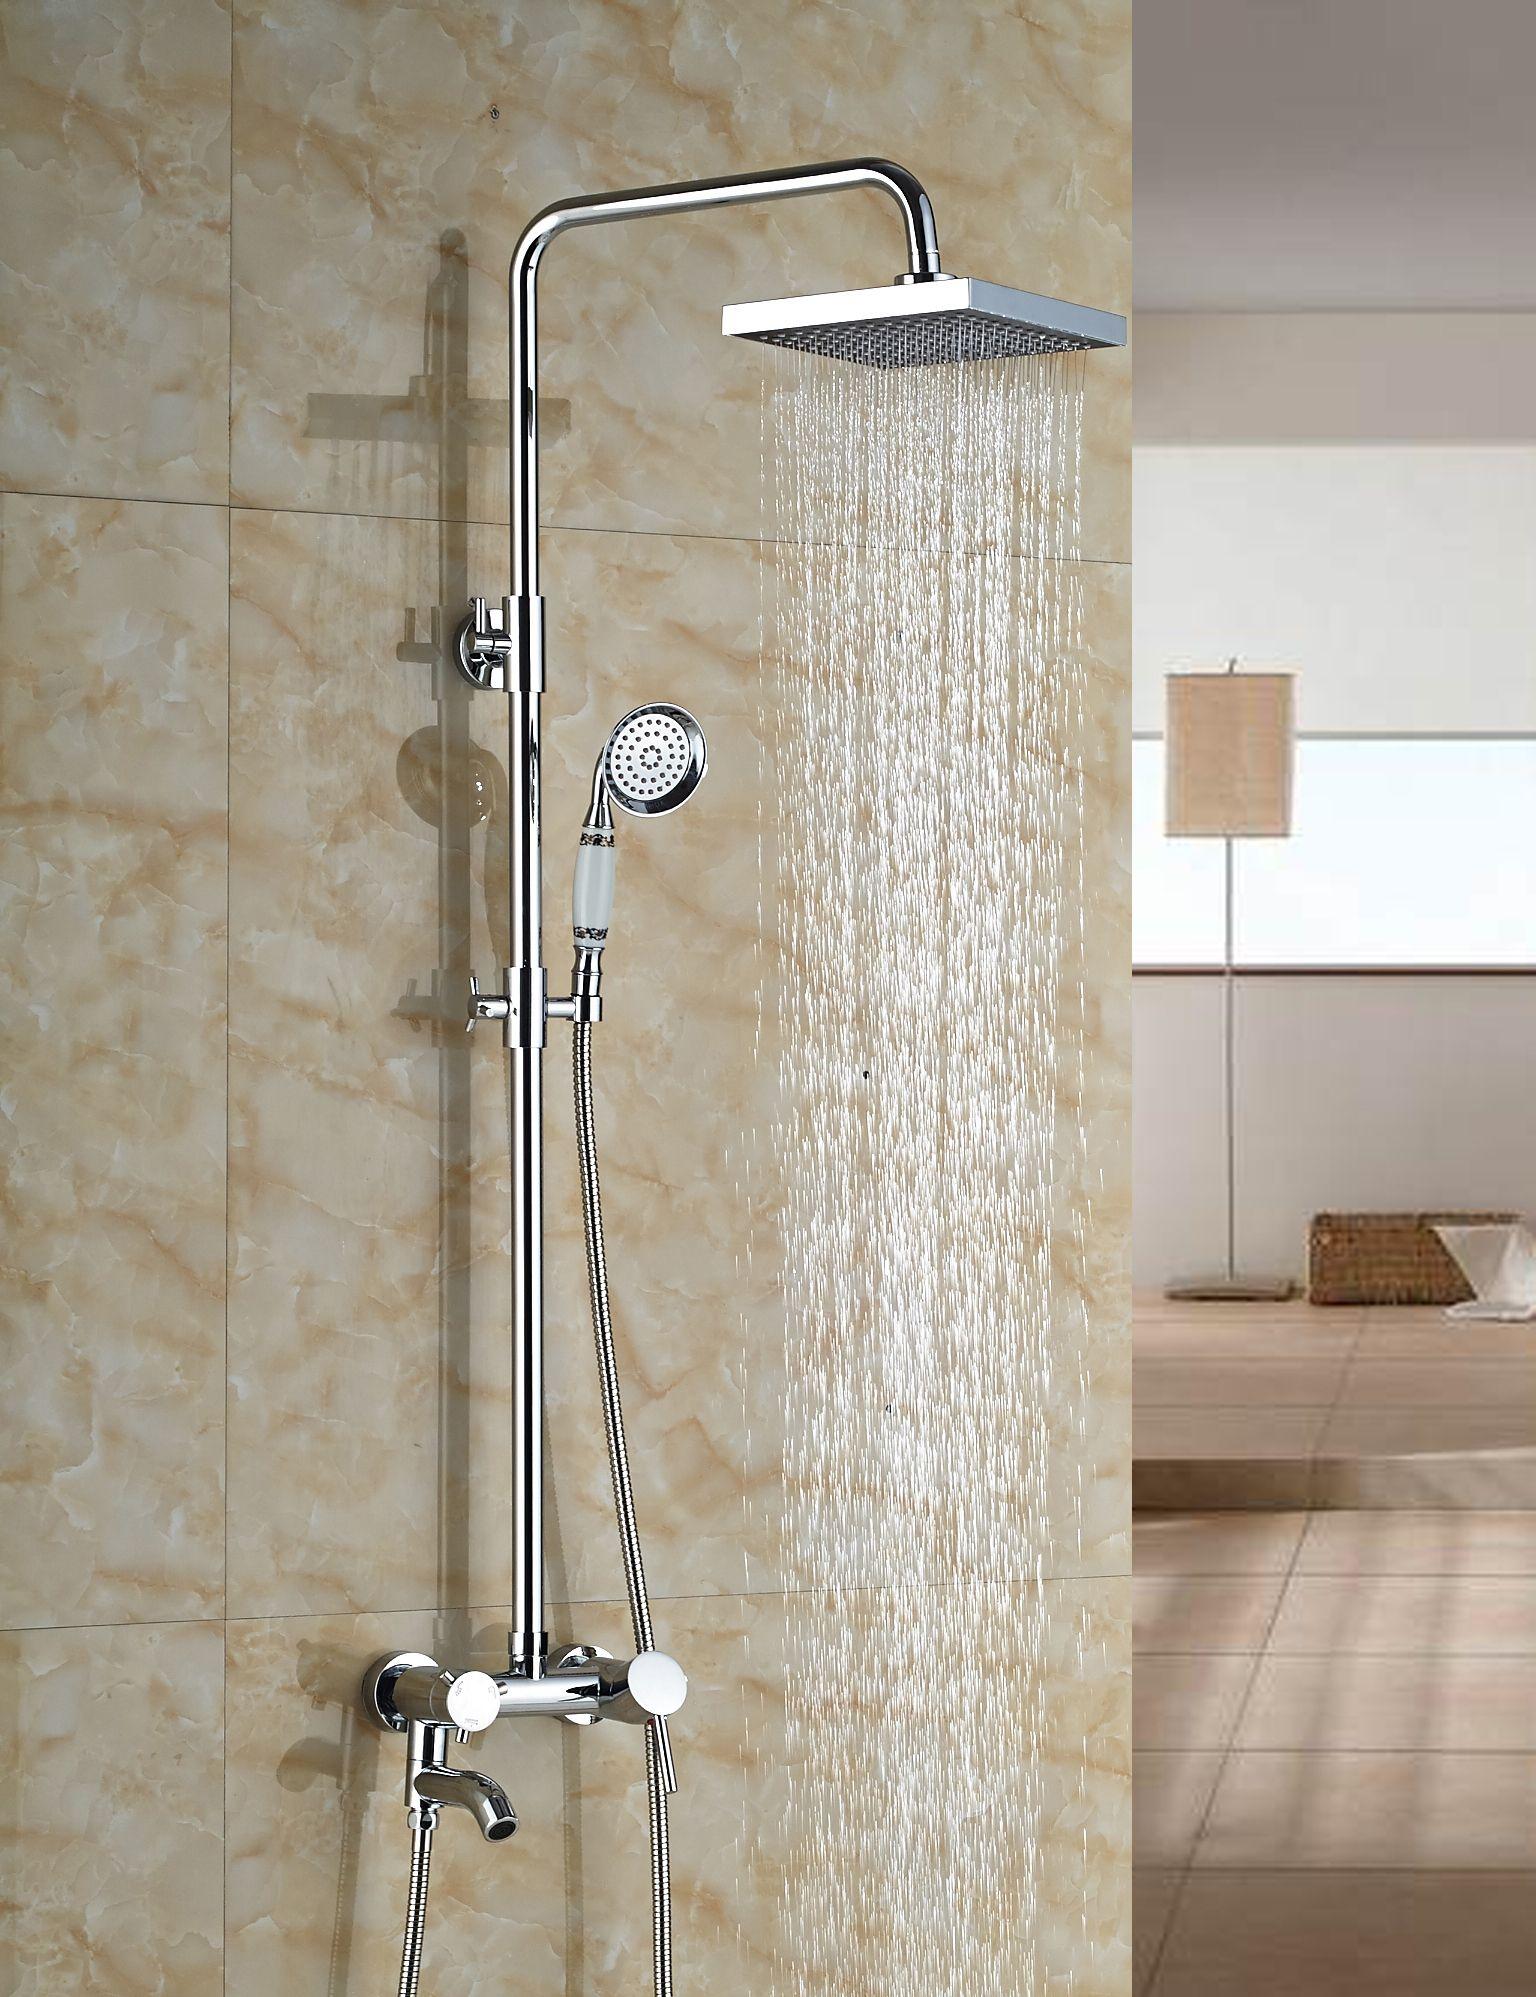 Wholesale And Retail Luxury Rain Shower Faucet